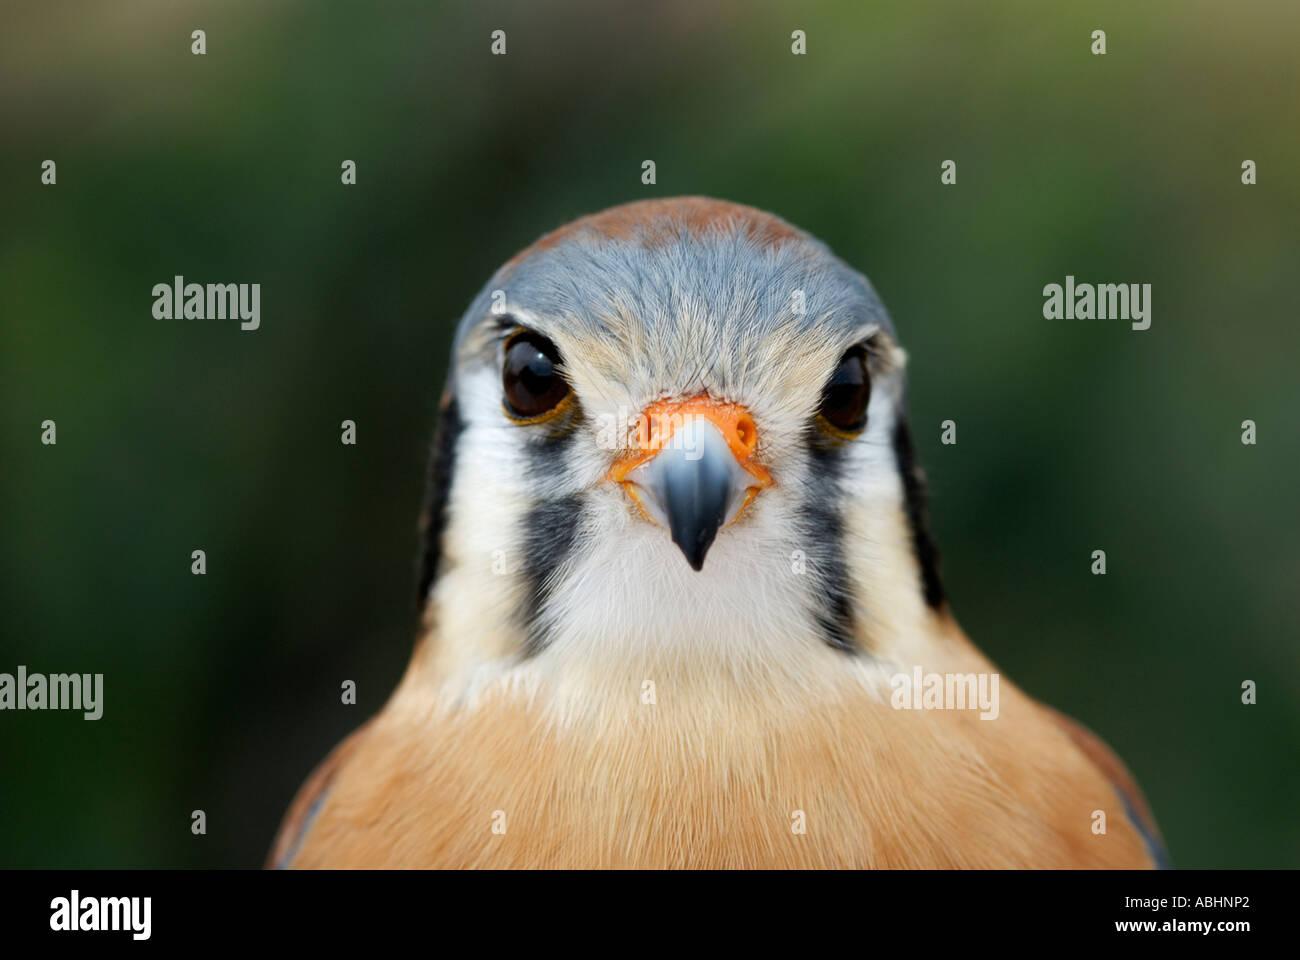 American kestrel, Falco sparverius, close-up of face showing facial stripes - Stock Image